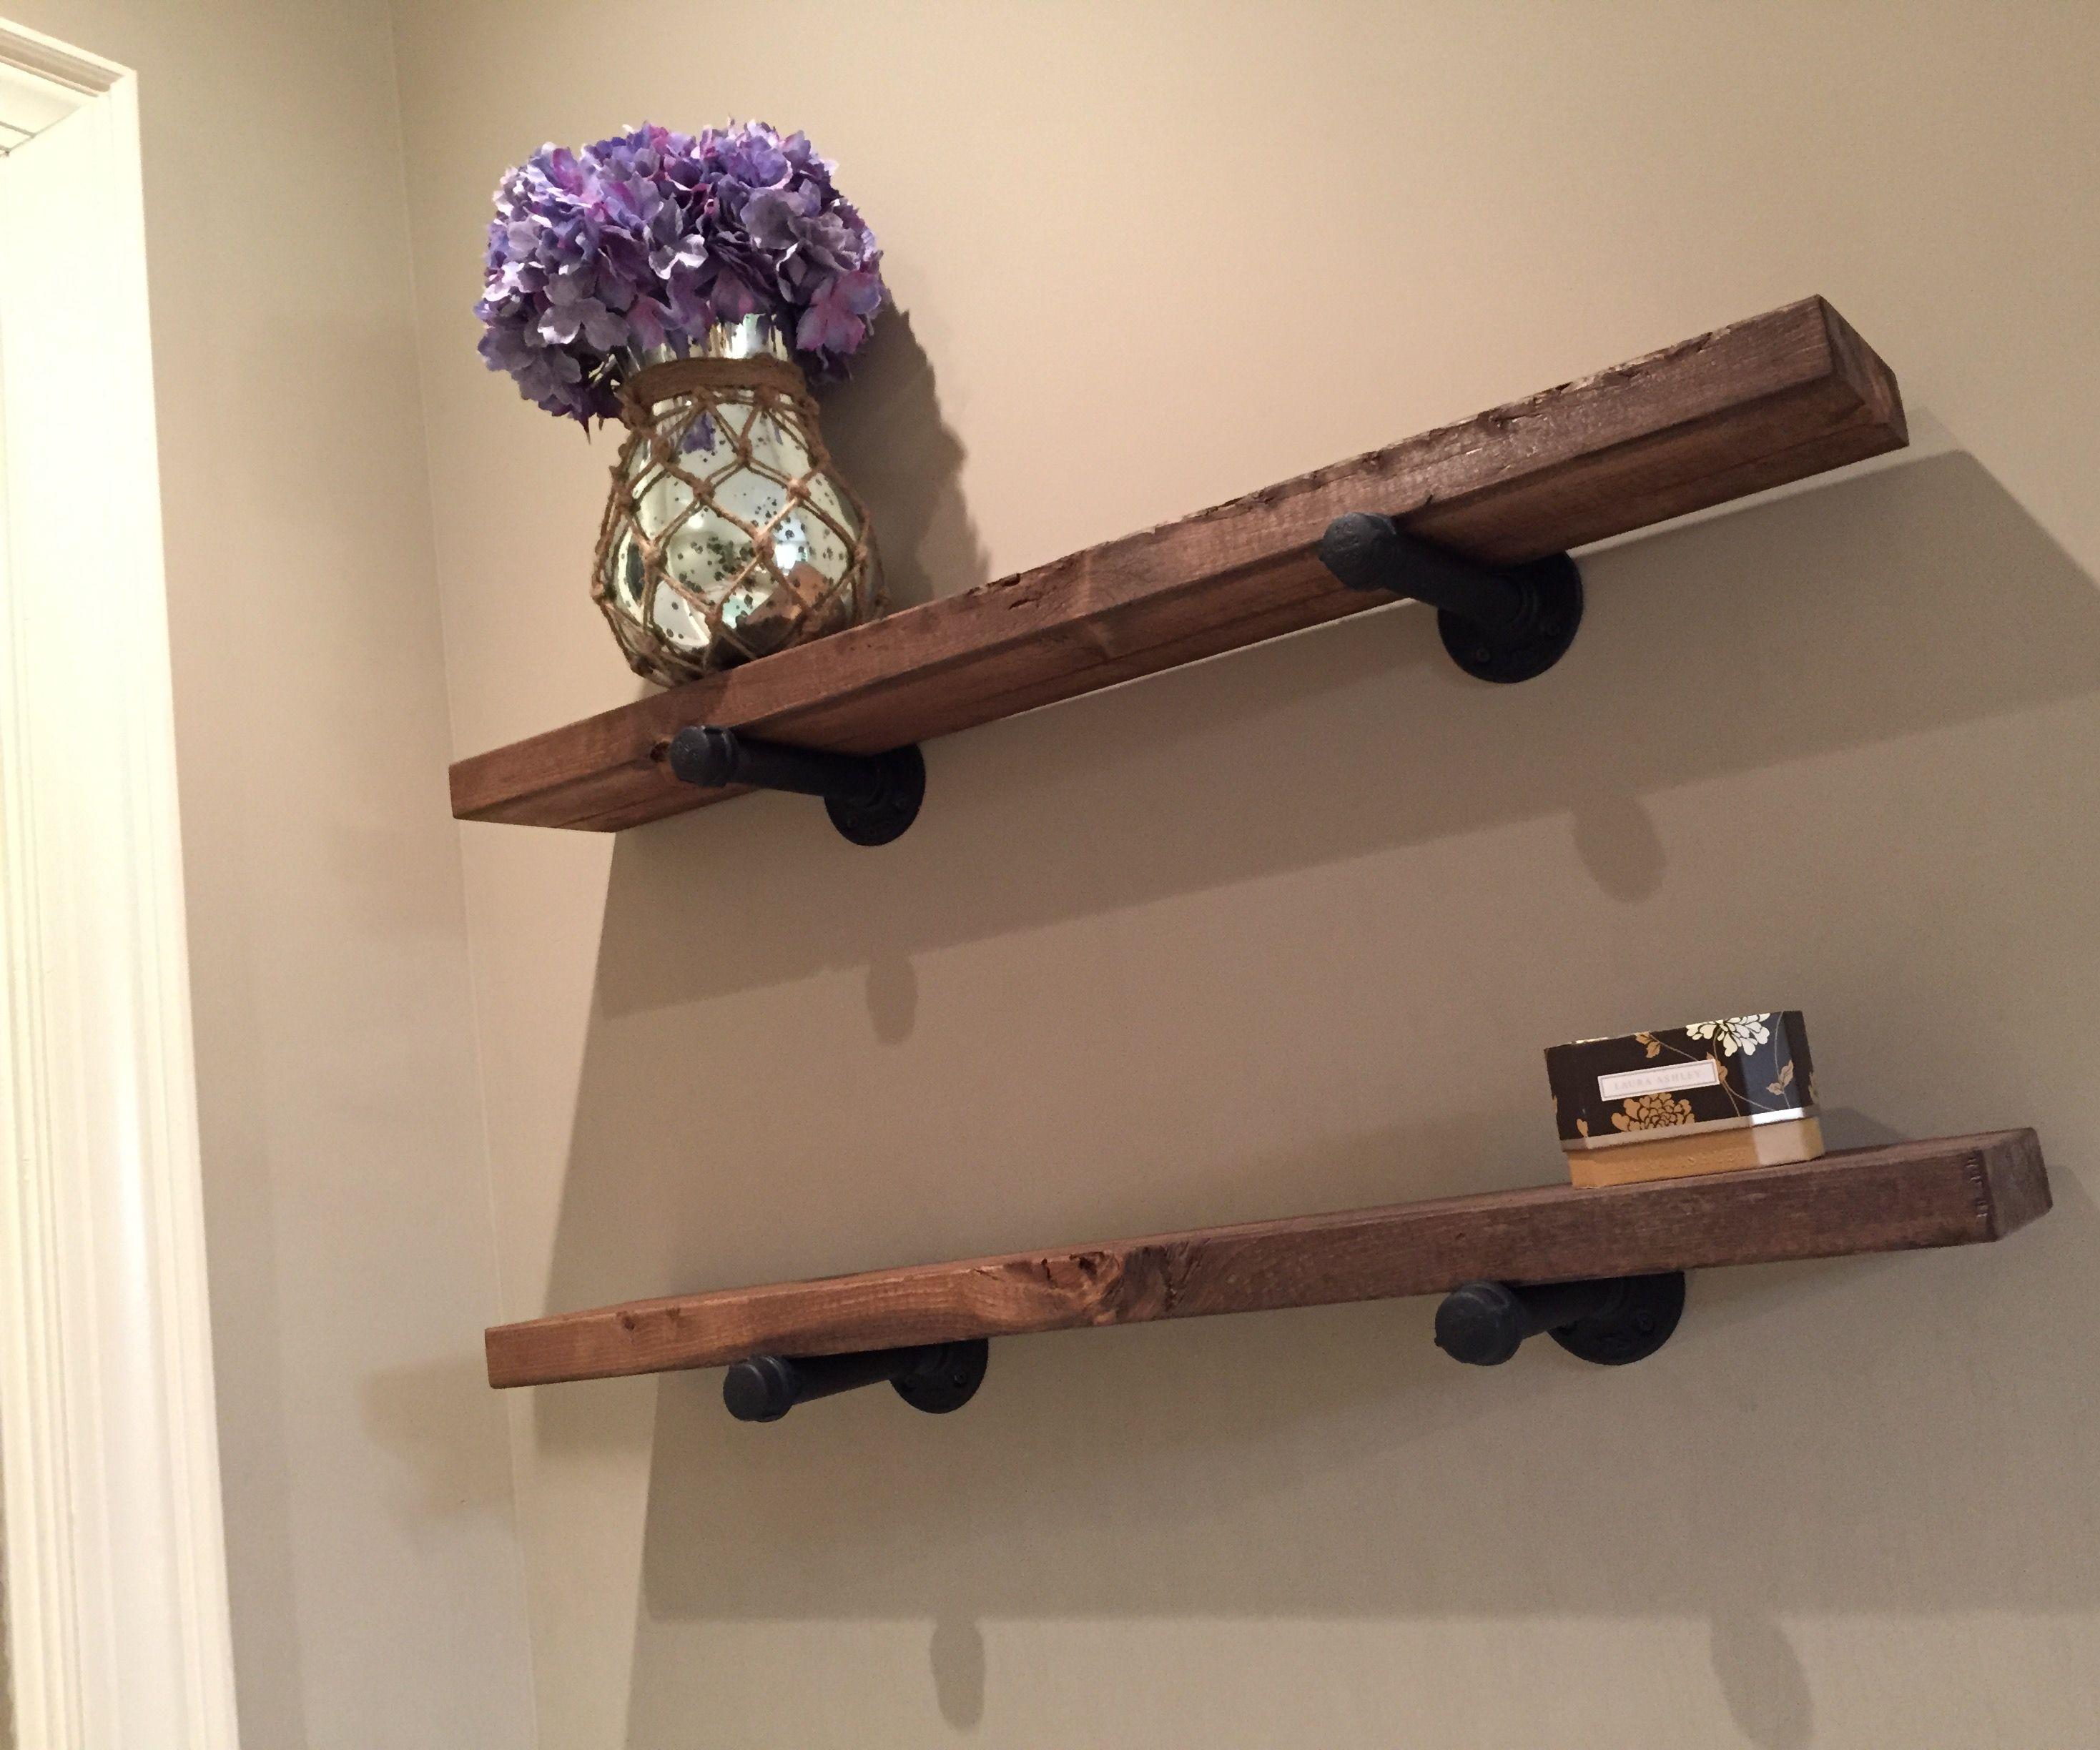 Simple Iron & Wood Shelves